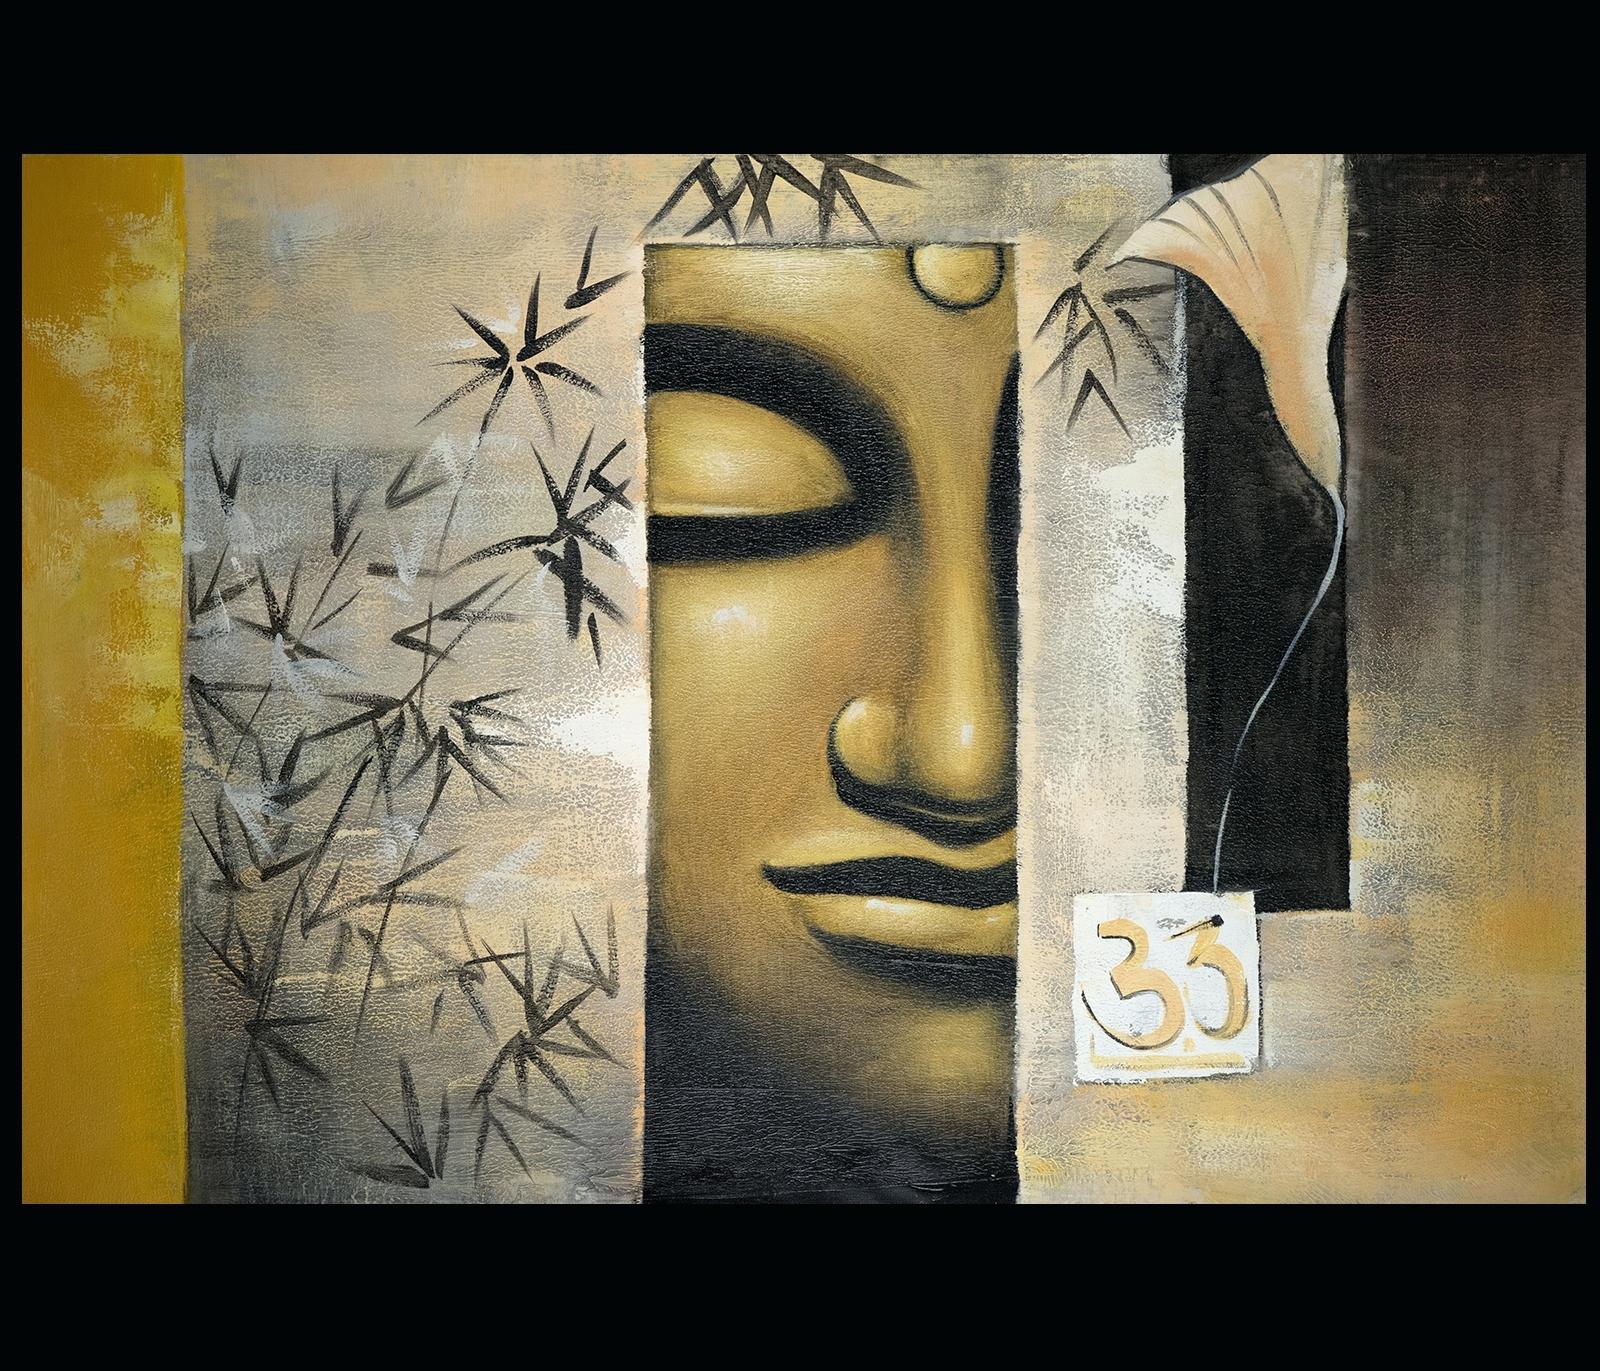 Wall Arts ~ Buddha Wall Art Amazon Buddha Wall Art Pier 1 Buddha Regarding Most Current India Abstract Metal Wall Art (View 7 of 20)